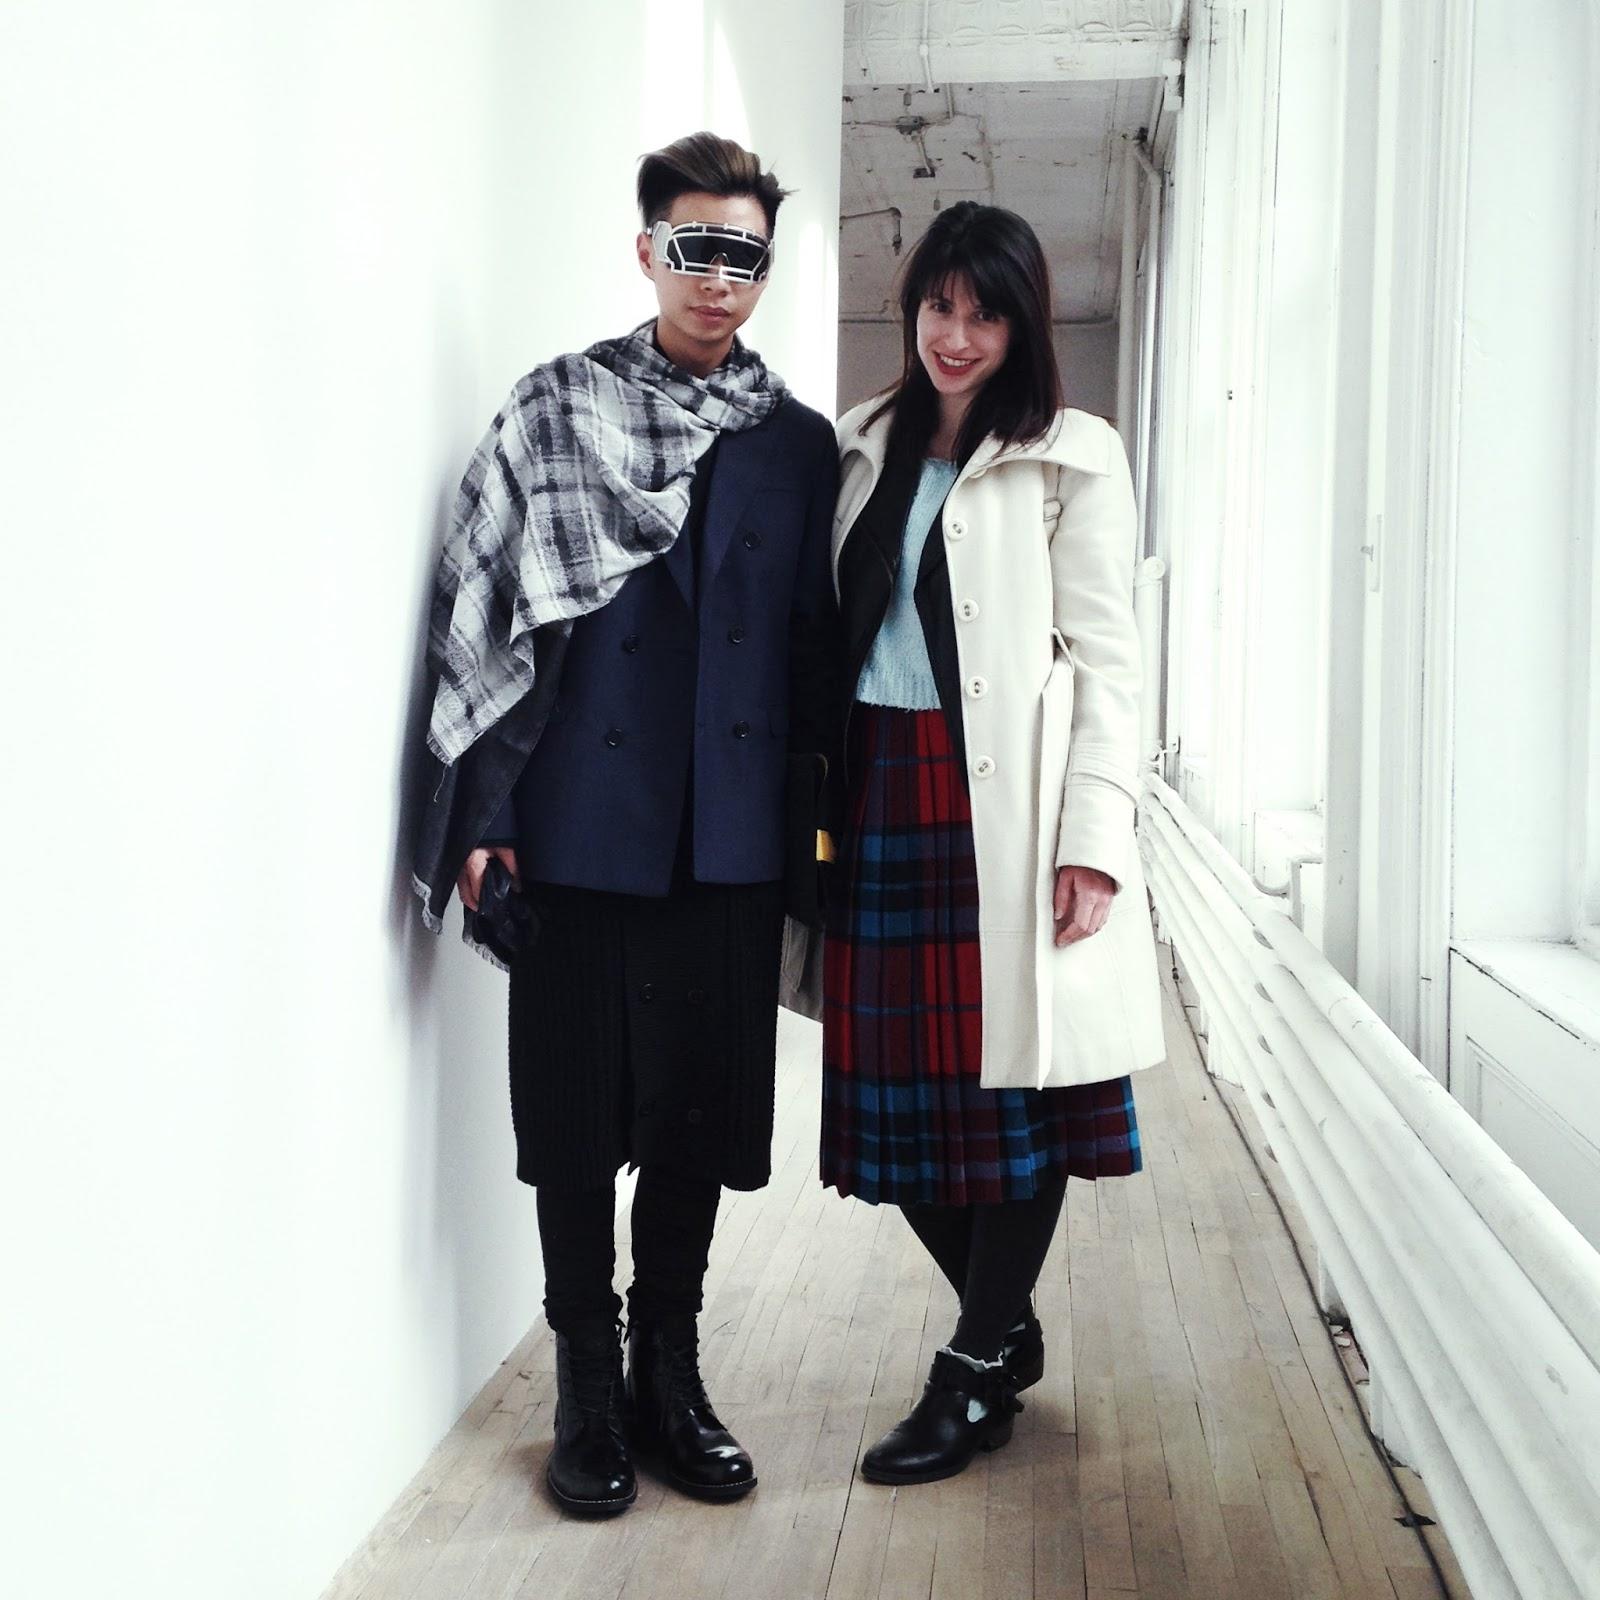 mybelonging-tommylei-nyfw-streetstyle-acnestudios-kaopaoshu-ktz-sunglasses-neilbarrett3.JPG